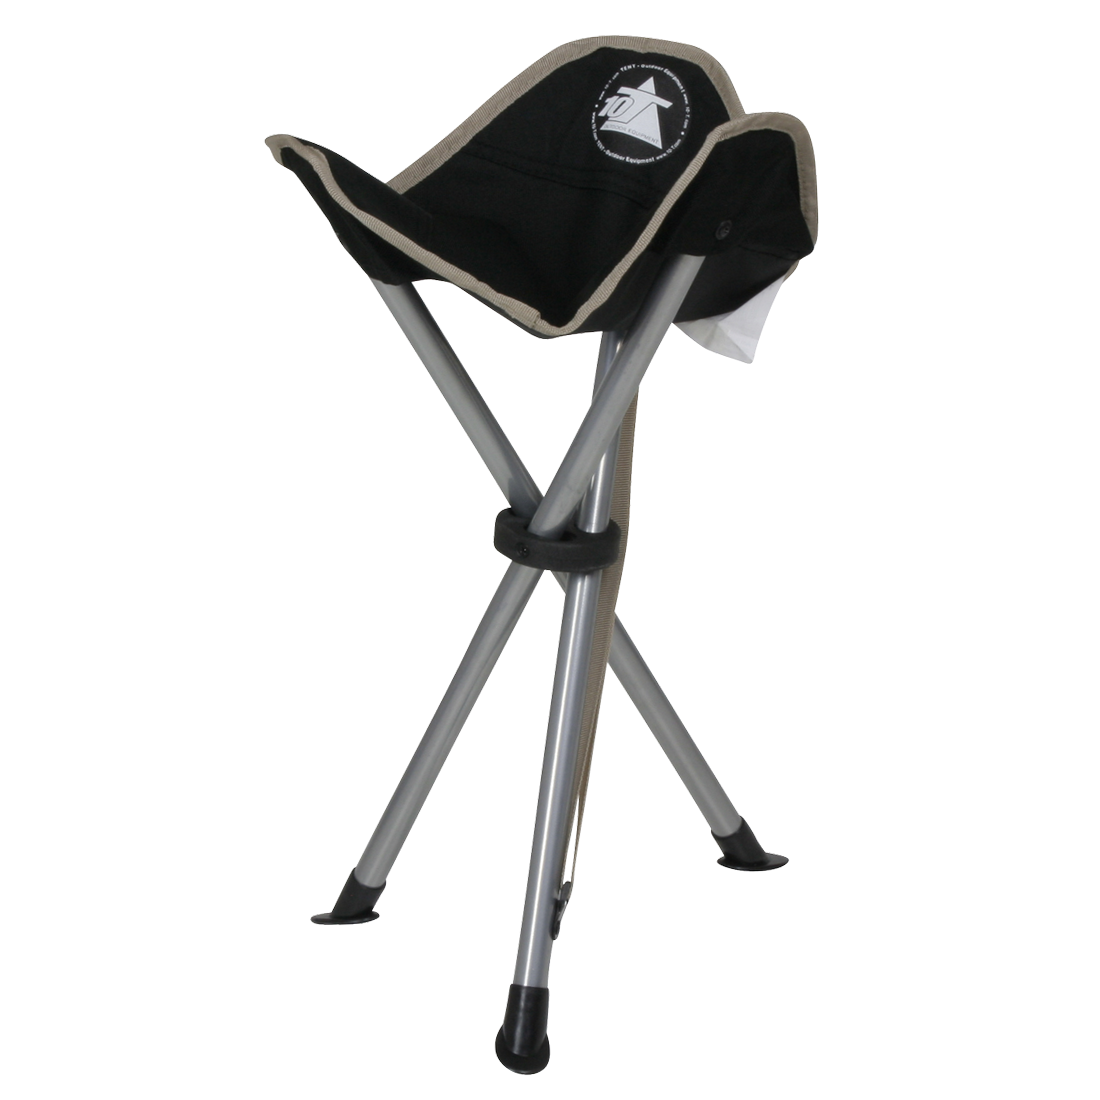 Handy Camping Stools ~ T tripod camping chair three leg stool cm seat